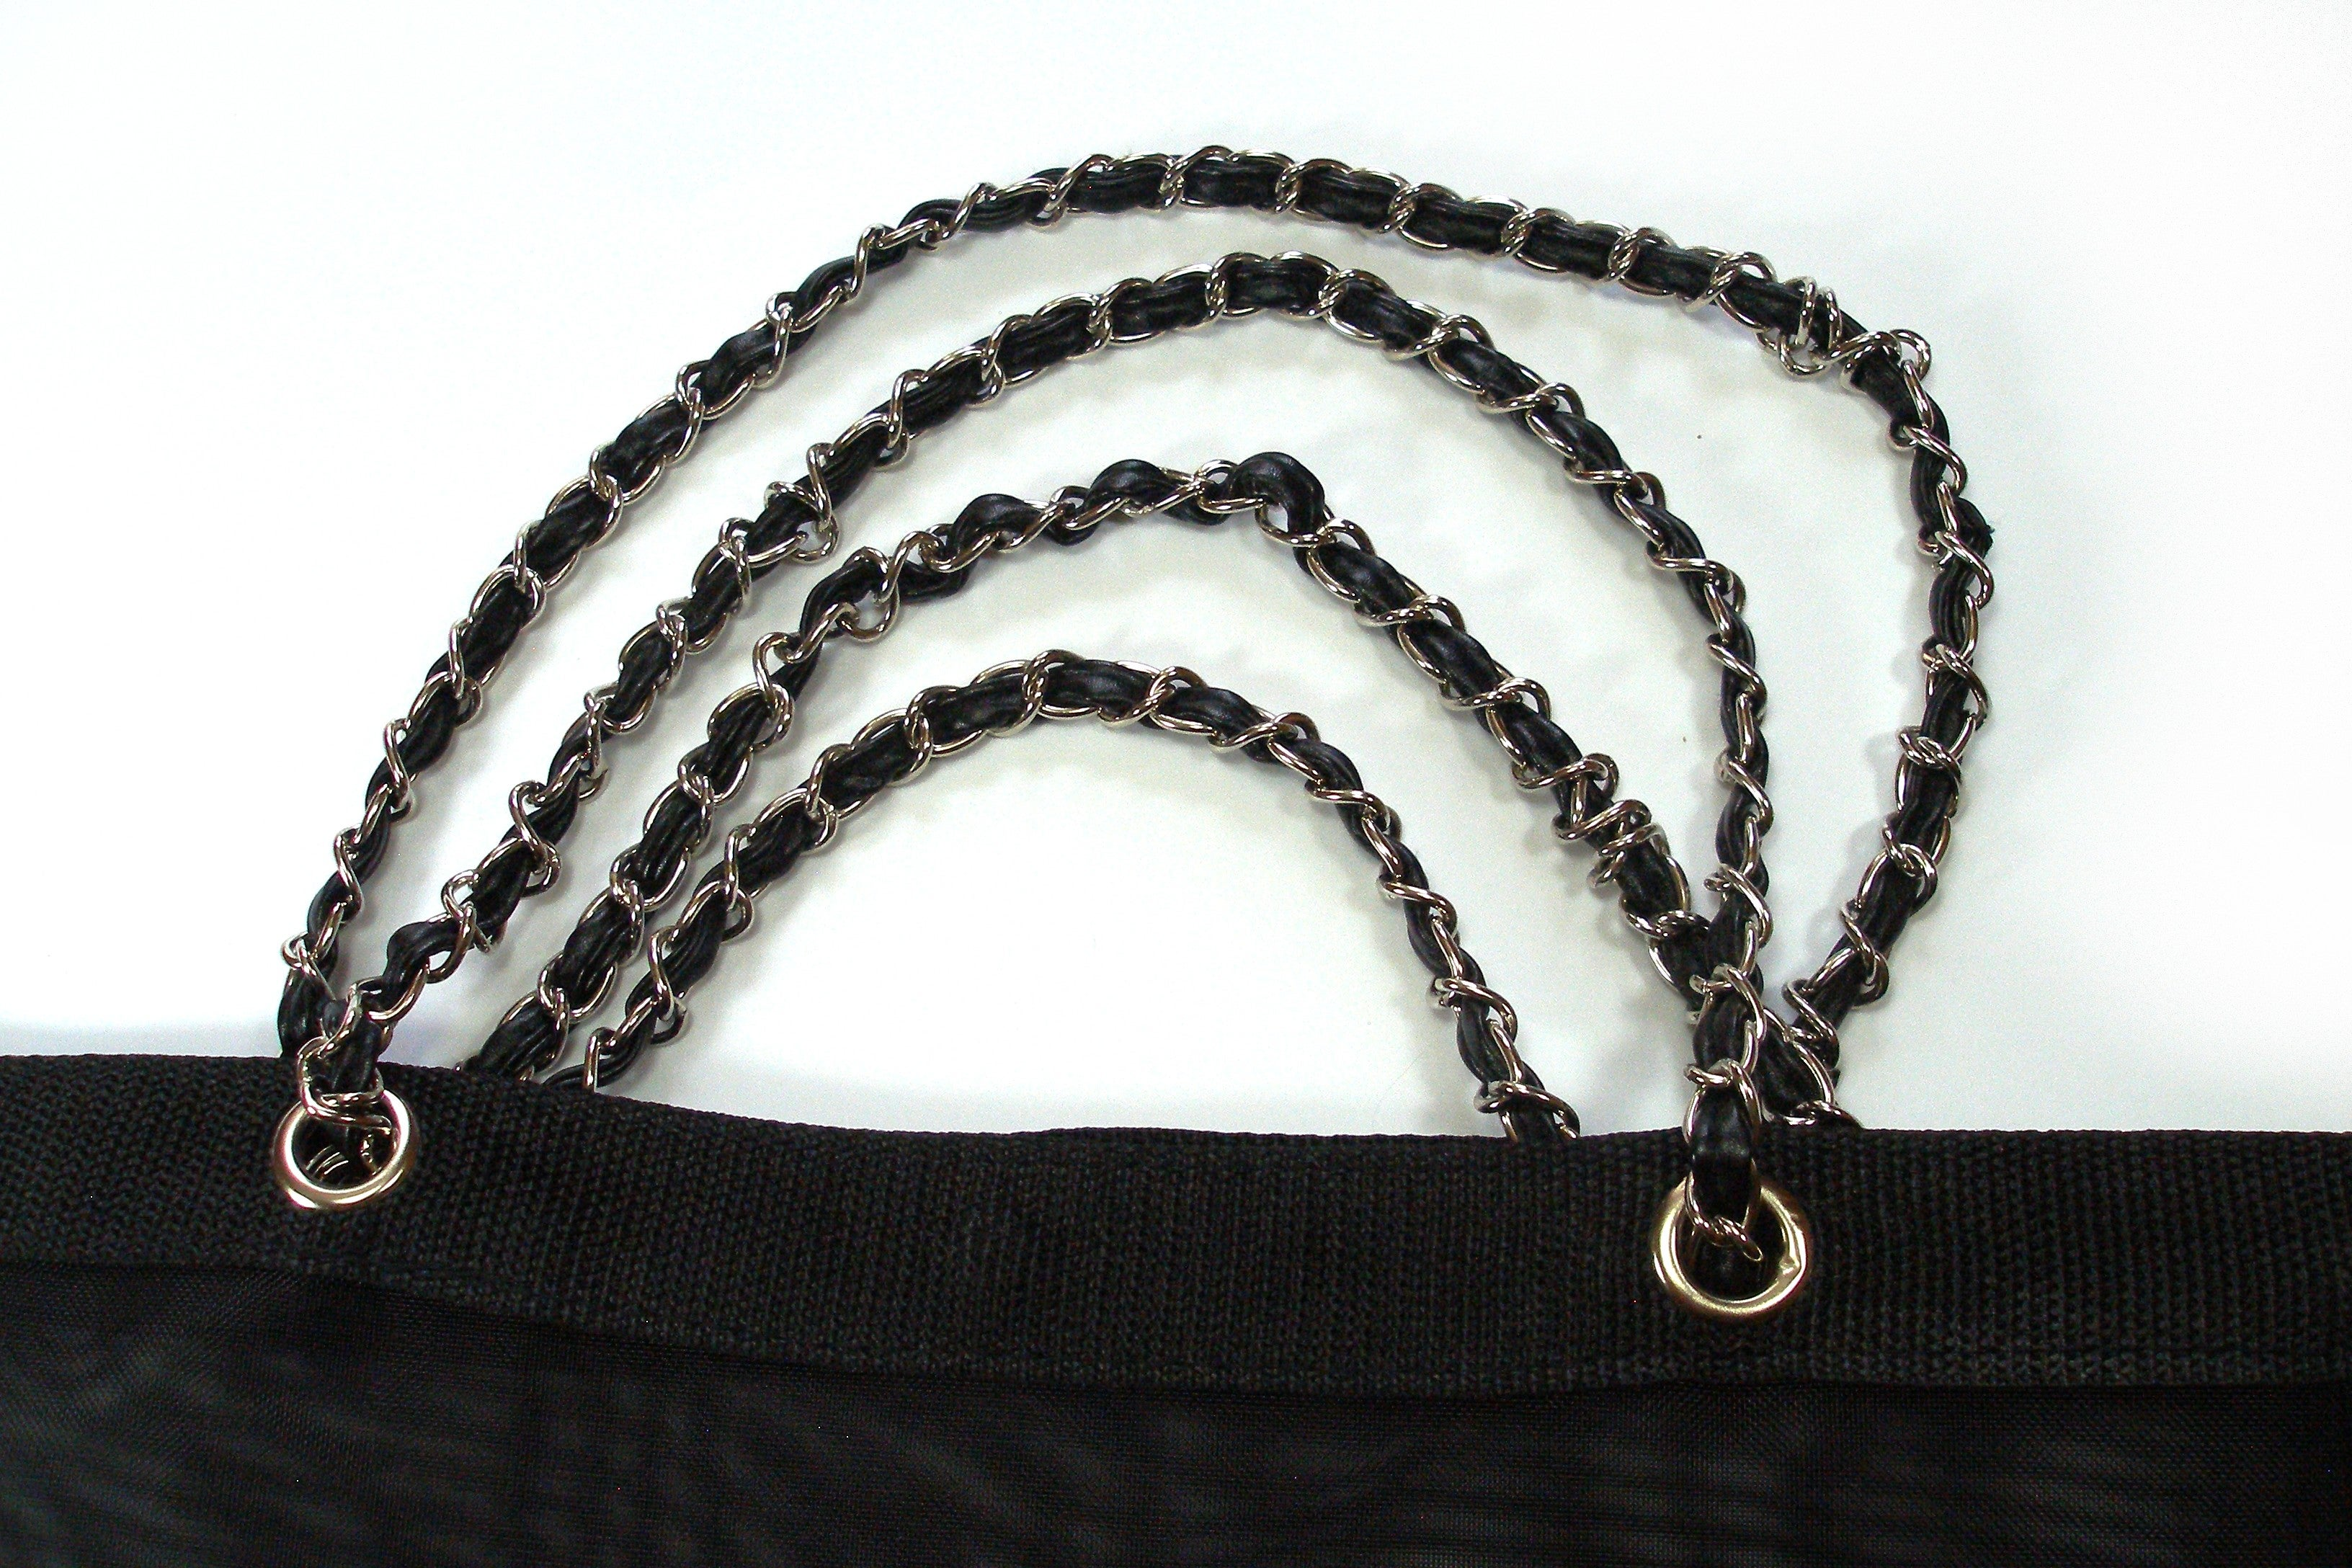 0c6cce019289cd CHANEL VIP Black Mesh Tote Bag Shopping Travel SHOPPER / BRAND NEW at  1stdibs